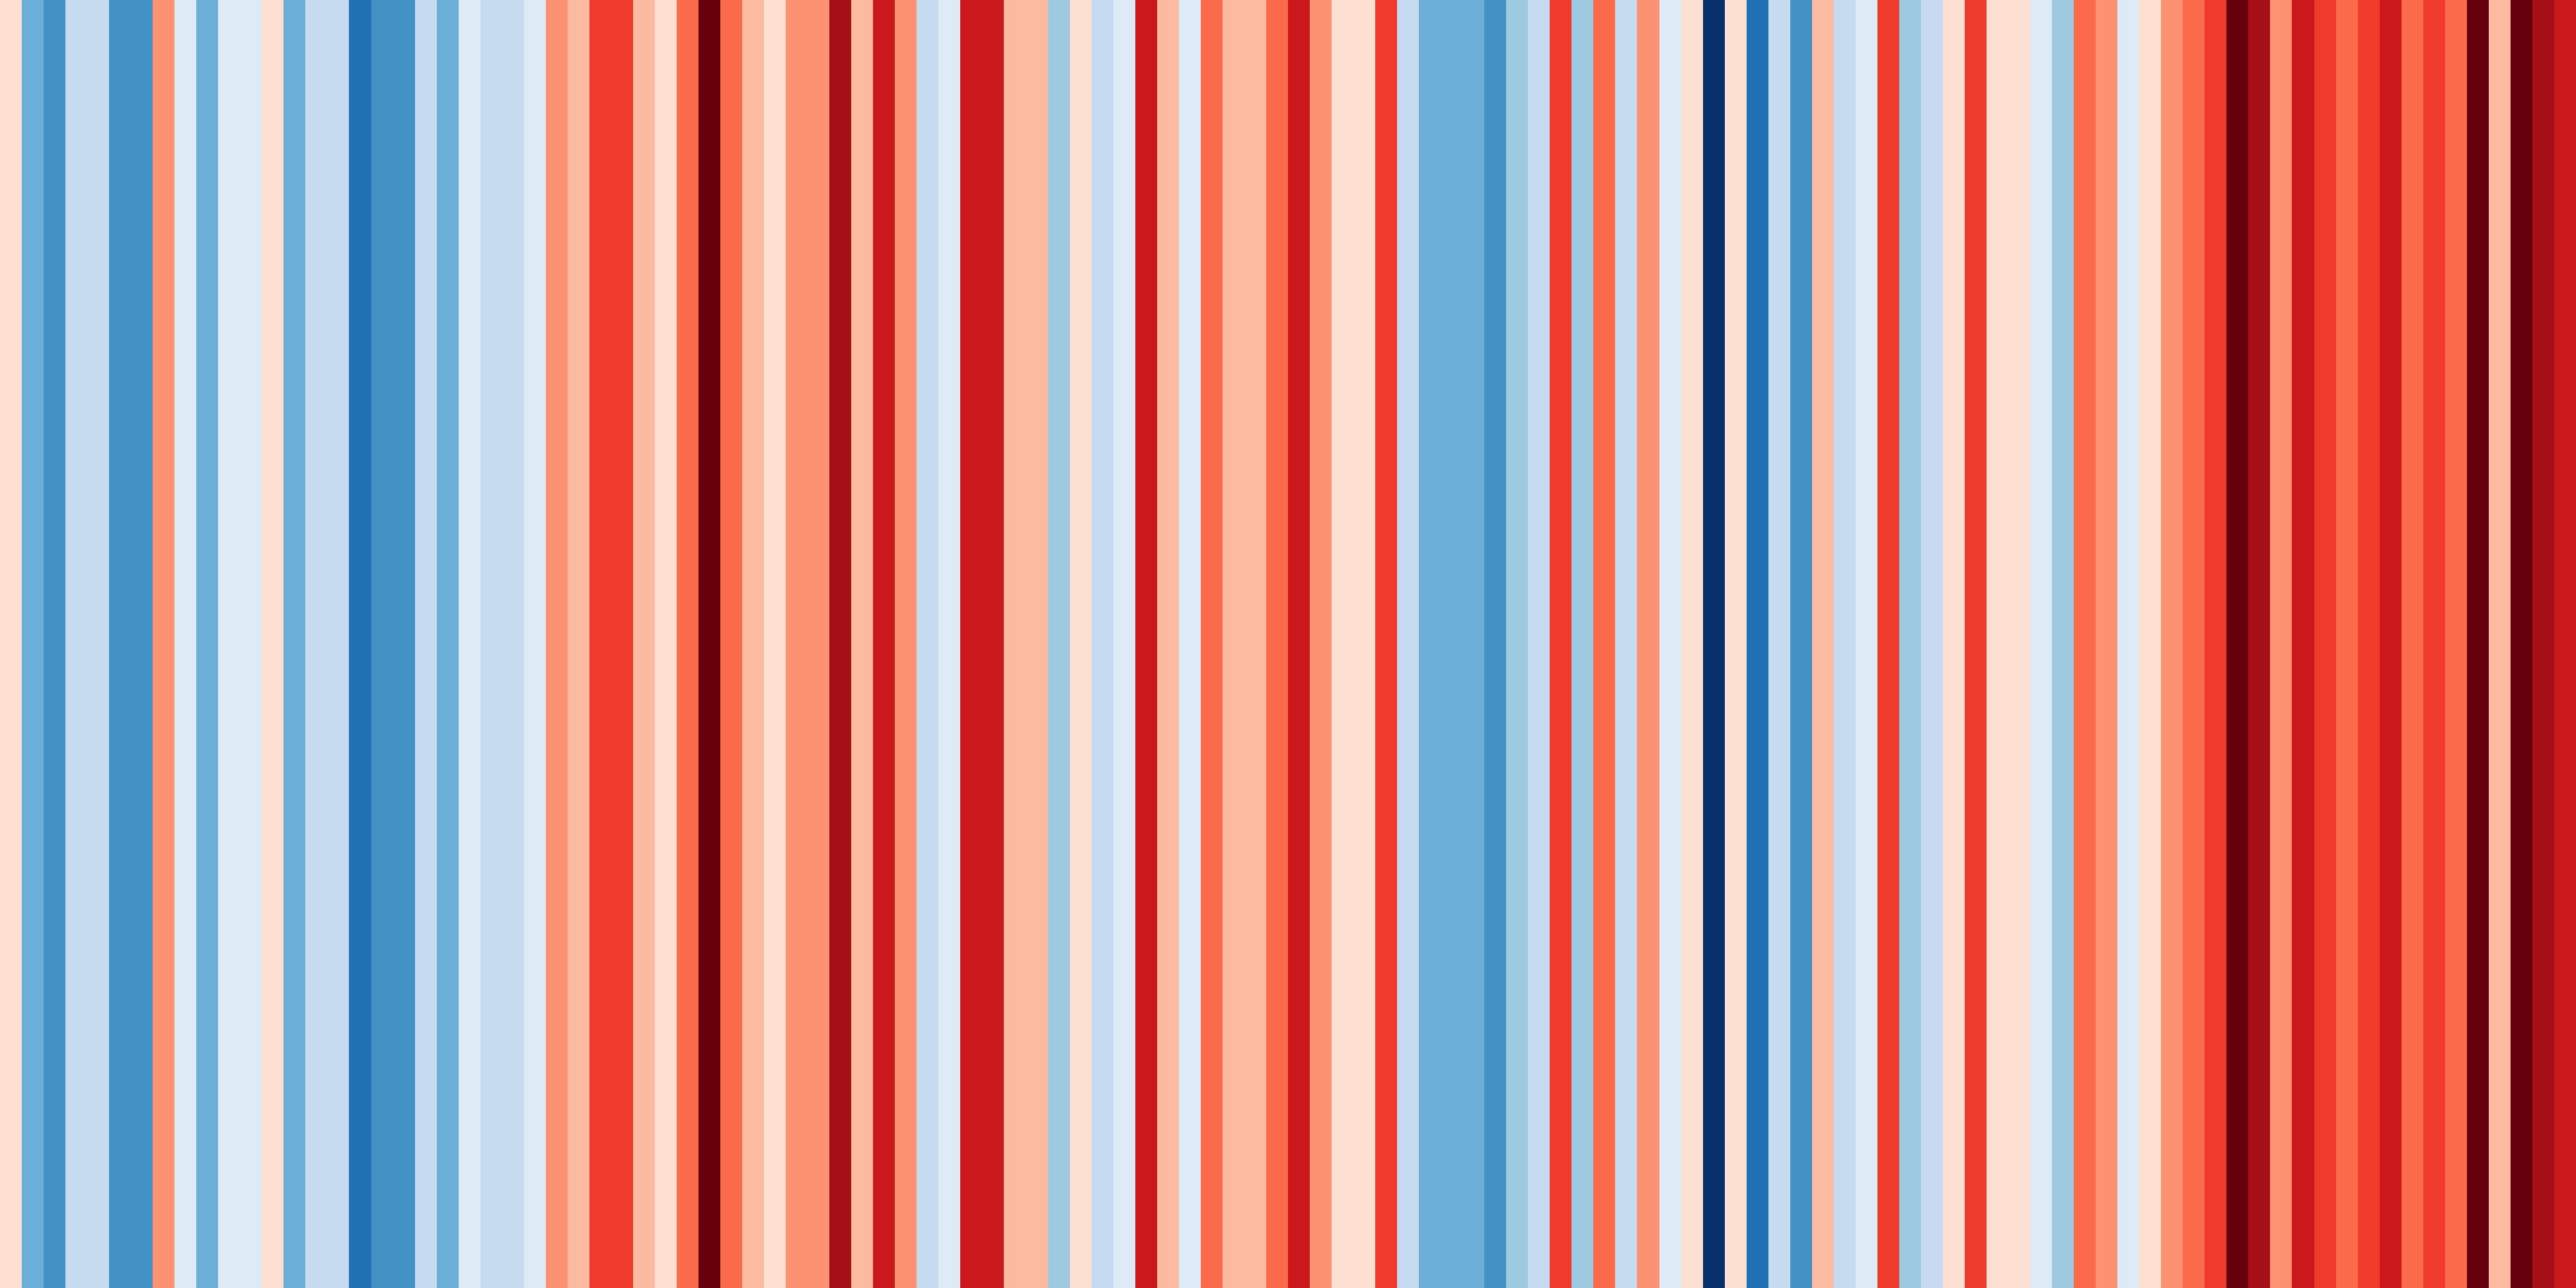 _stripes_europe-iceland--1901-2018-bk.png